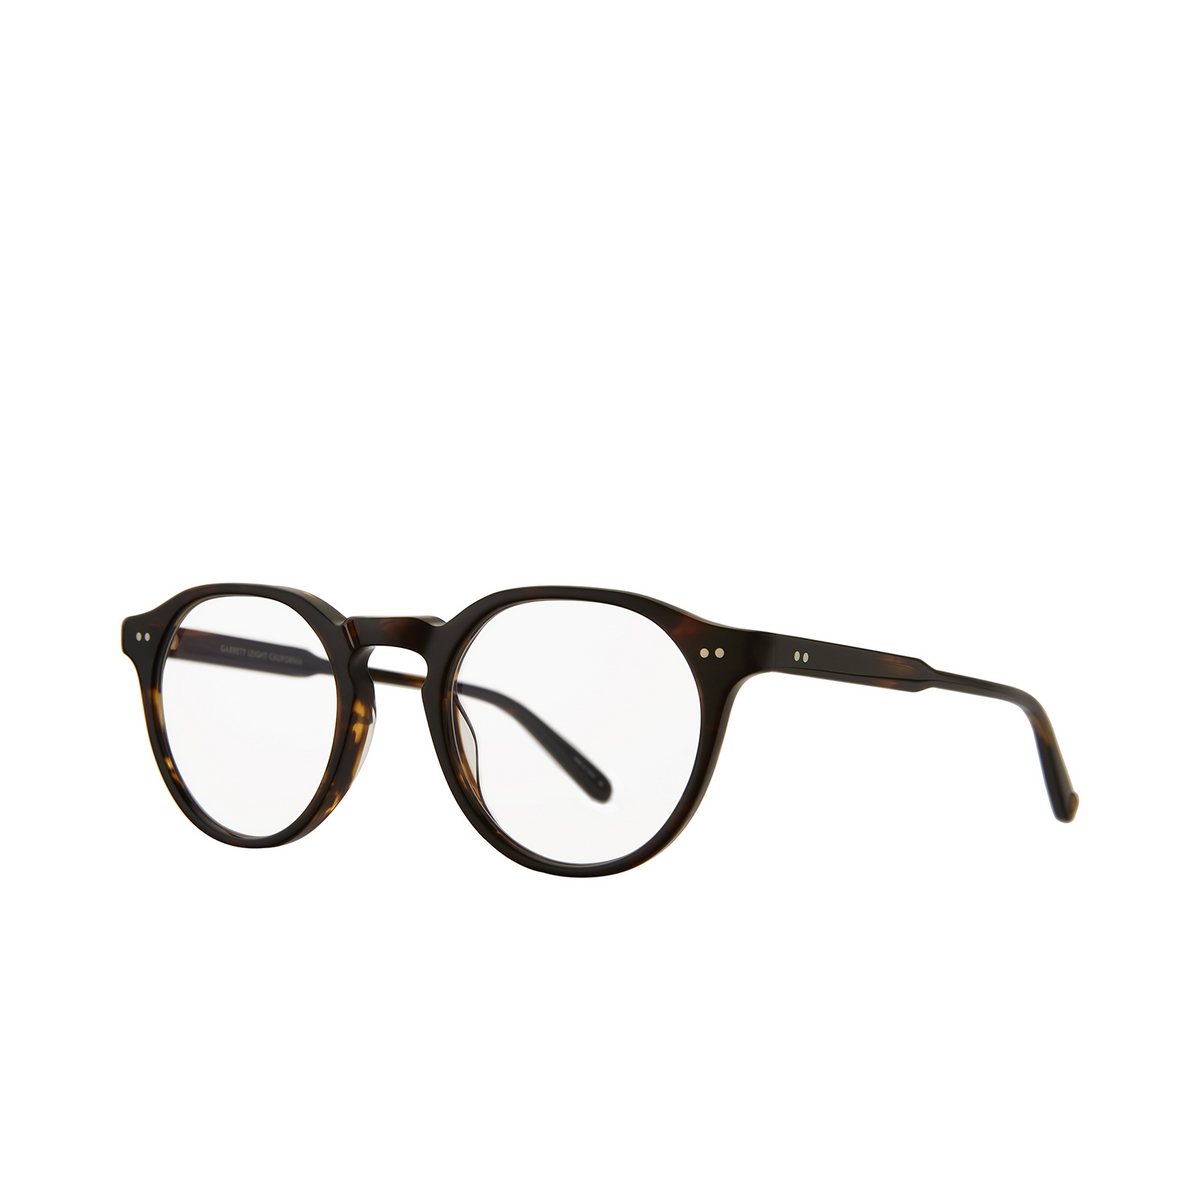 Garrett Leight® Round Eyeglasses: Royce color Coffee Tortoise Coft.